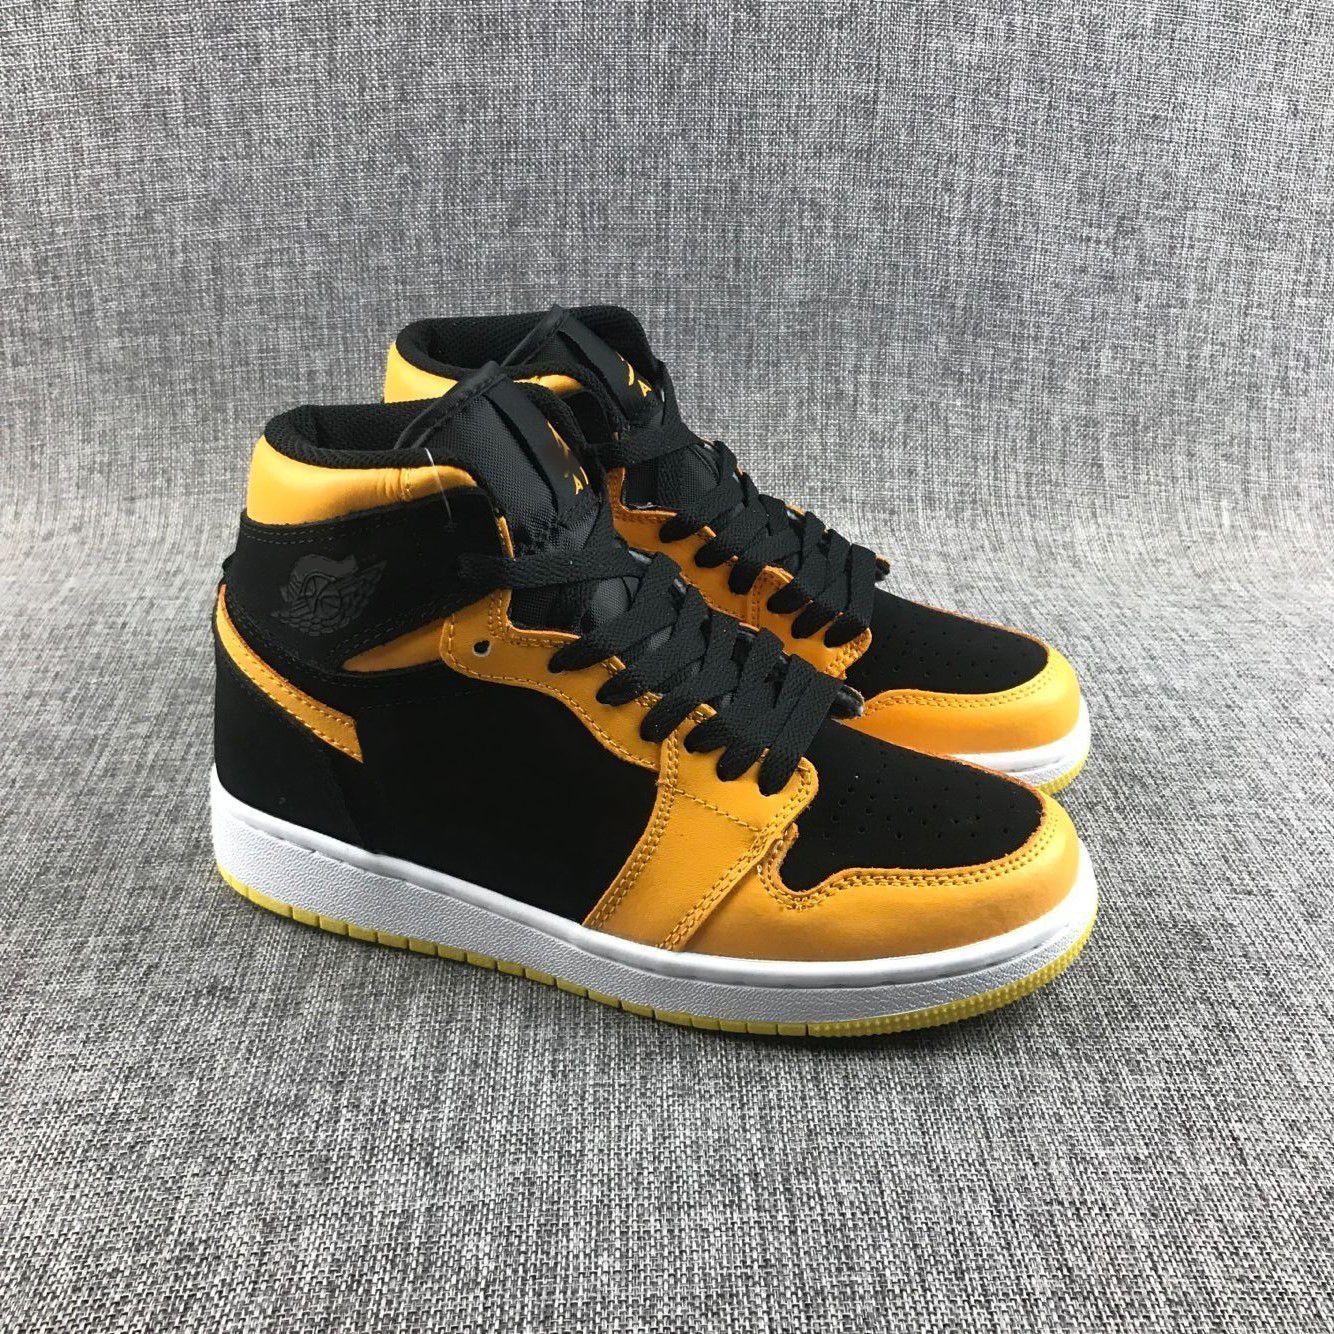 separation shoes d8050 38634 Acquista 1 Scarpe Da Basket Da Uomo 2019 Scarpe Da Ginnastica Progettate Da  Designer Di Alta Qualità Con Scarpe Da Ginnastica Da Uomo, Tagliate Al  Quarzo, ...